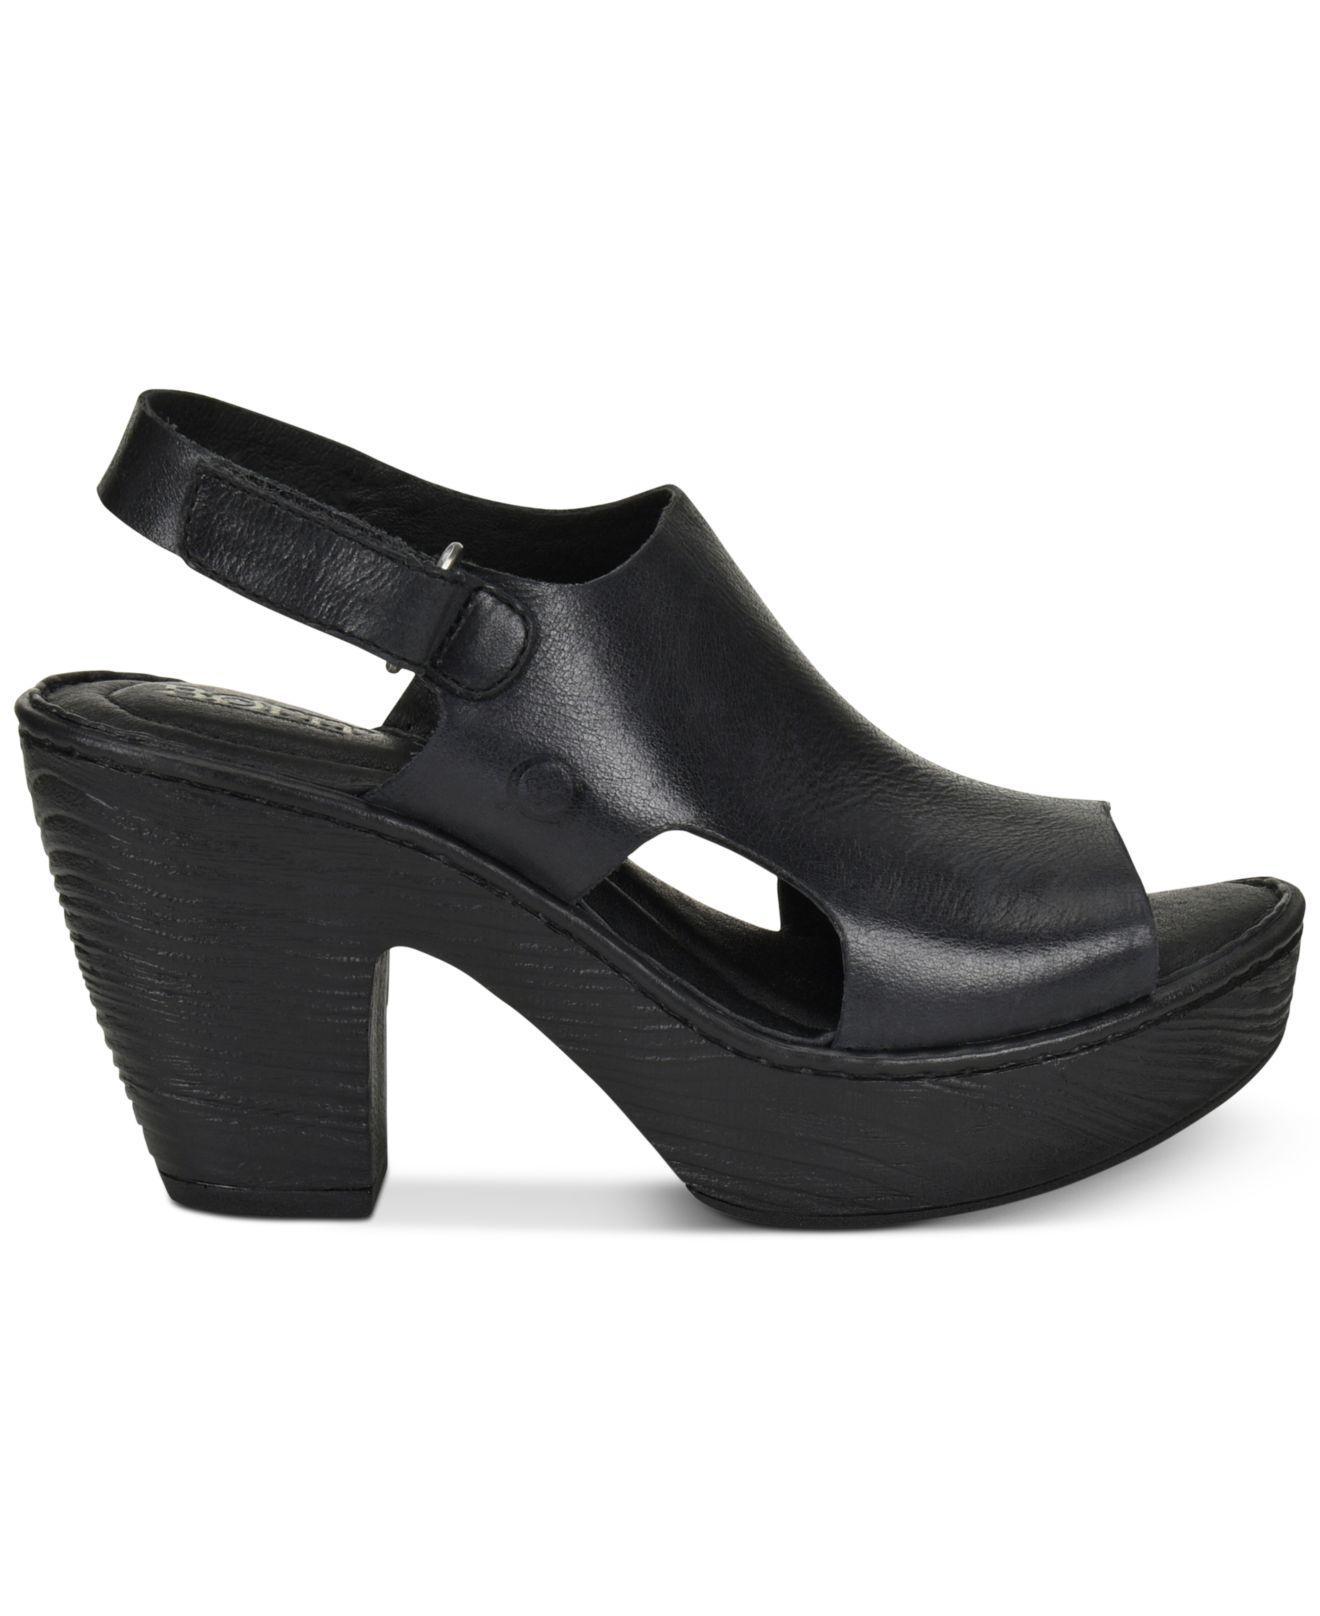 145c6a18959 Lyst - Born Ferlin Wedge Sandals in Black